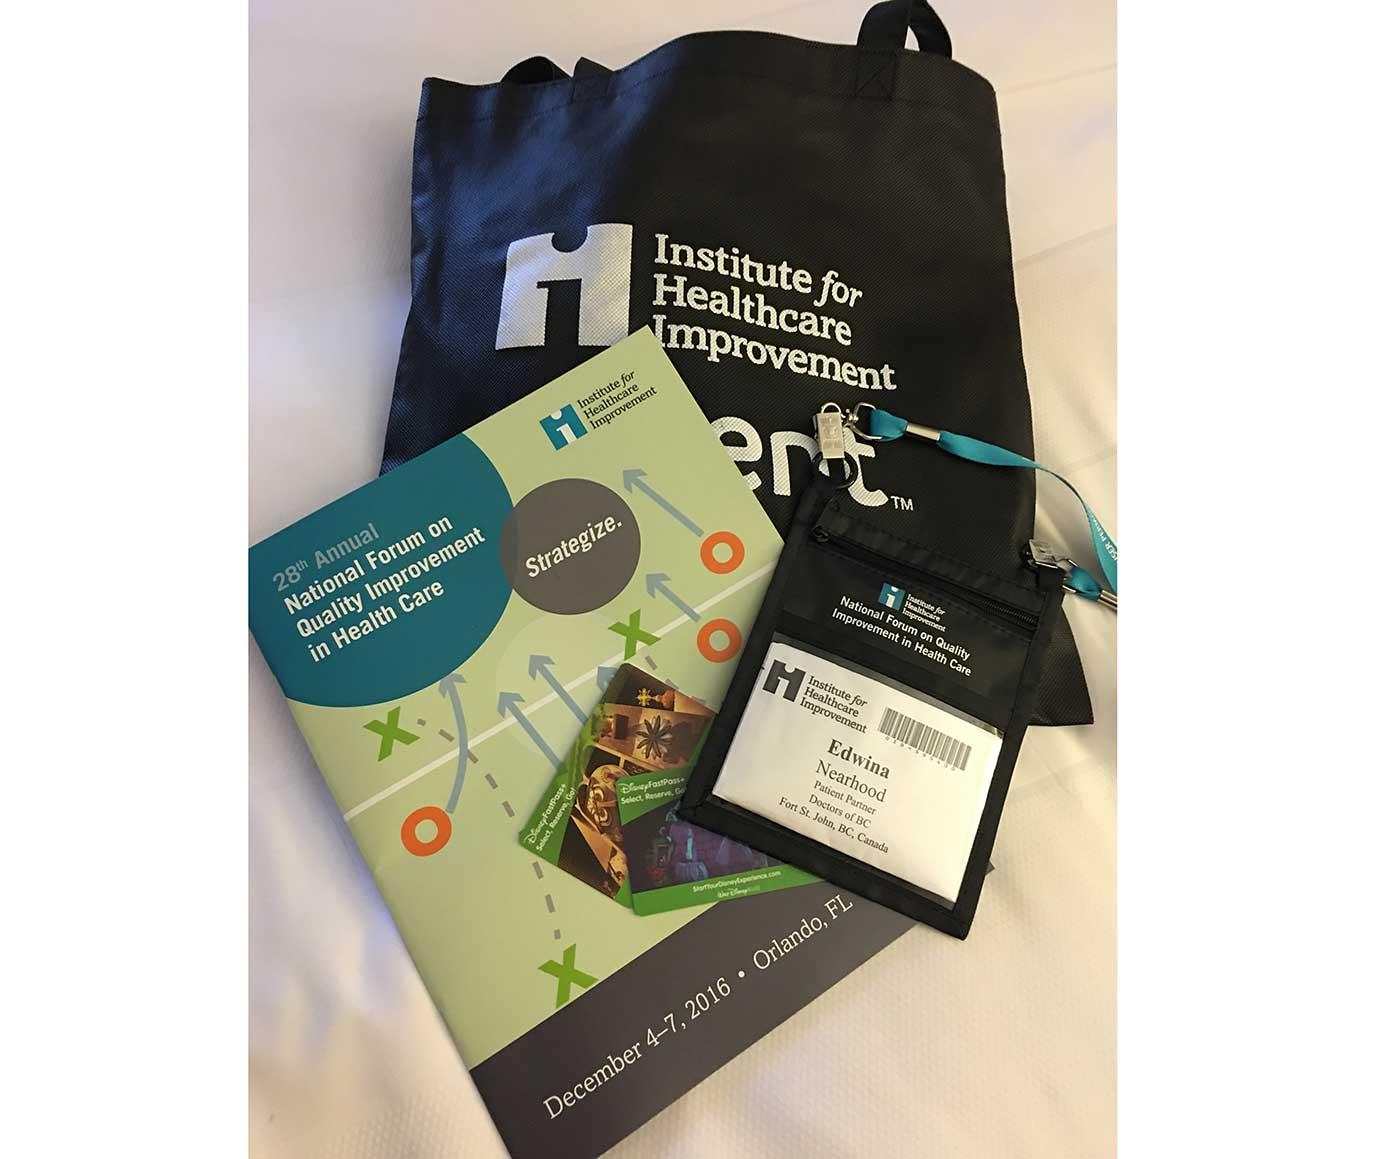 Edwina Nearhood at the IHI Conference in Orlando 2016